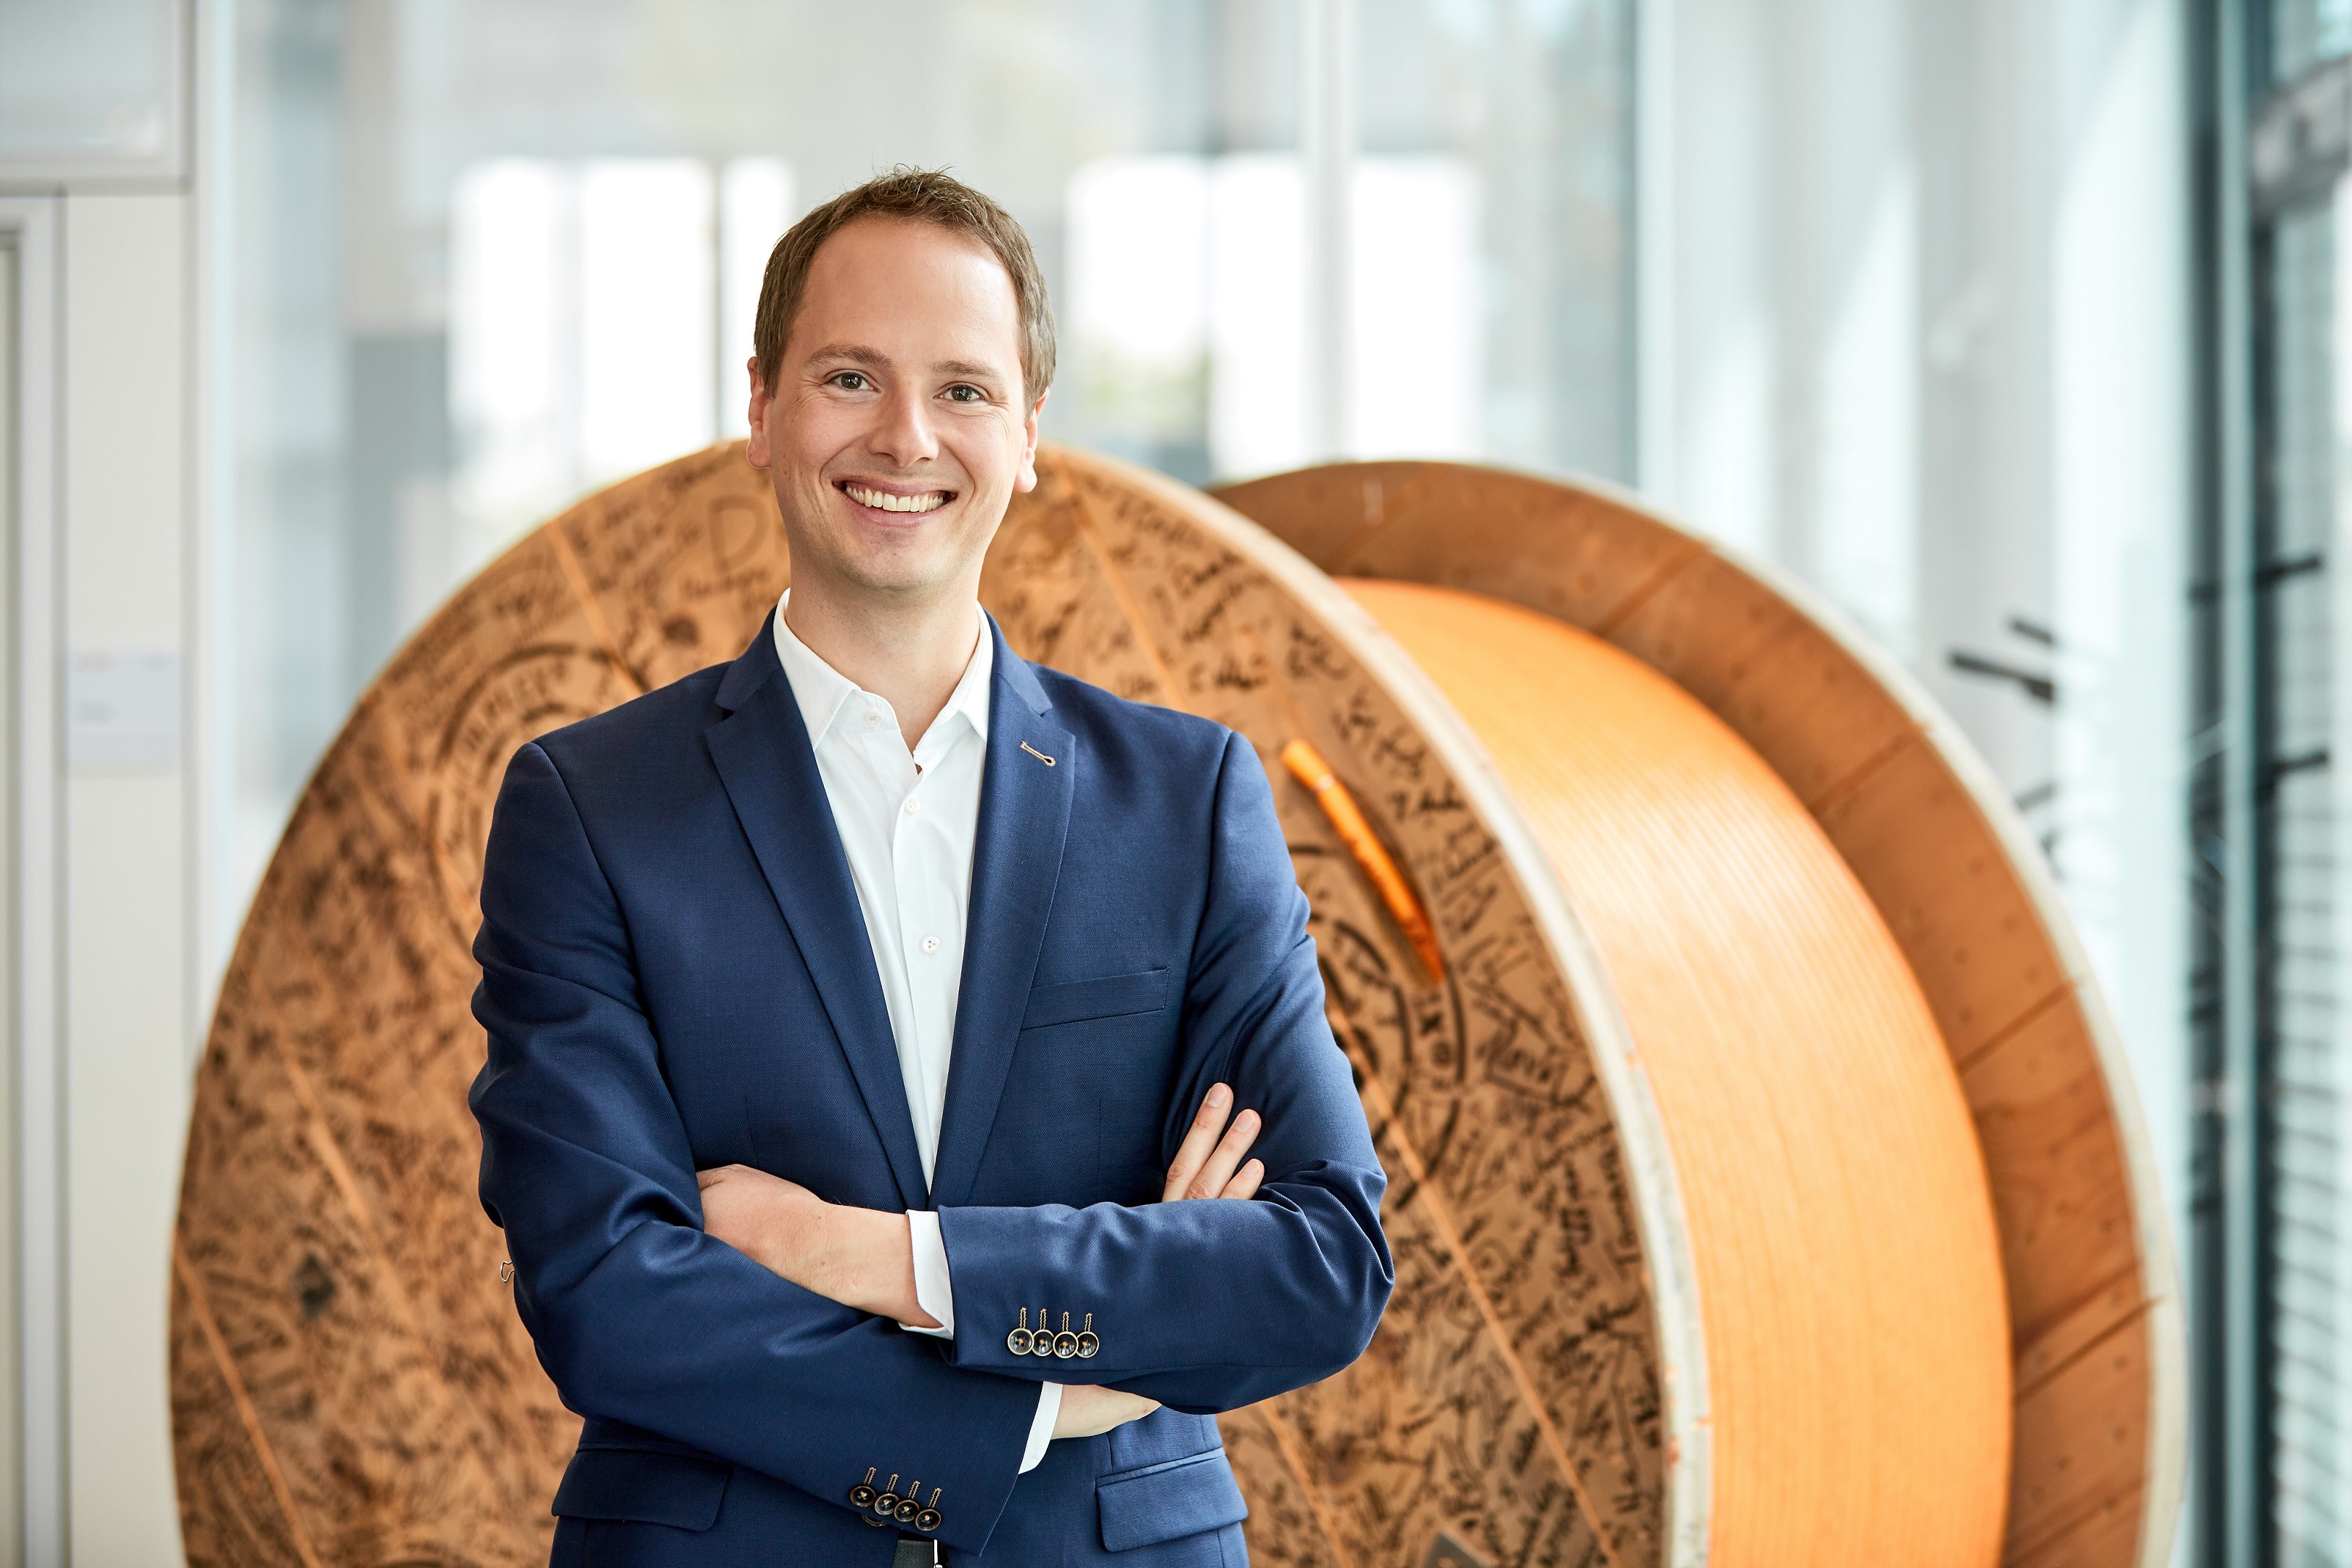 Matthias Lapp CEO for Latin America, Europe, Middle East, Africa (LA EMEA)